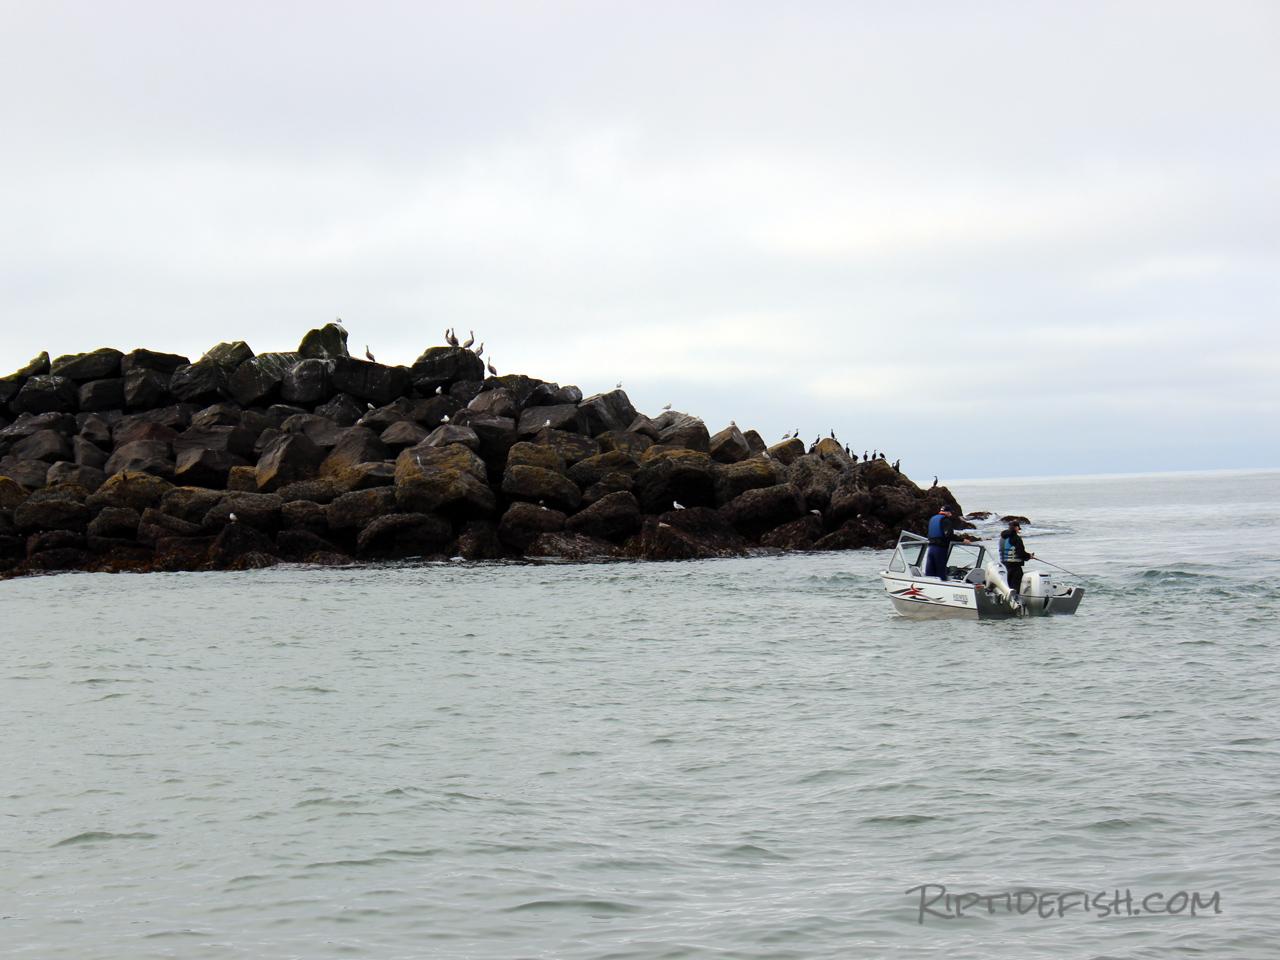 Westport Jetty Fishing Lingcod